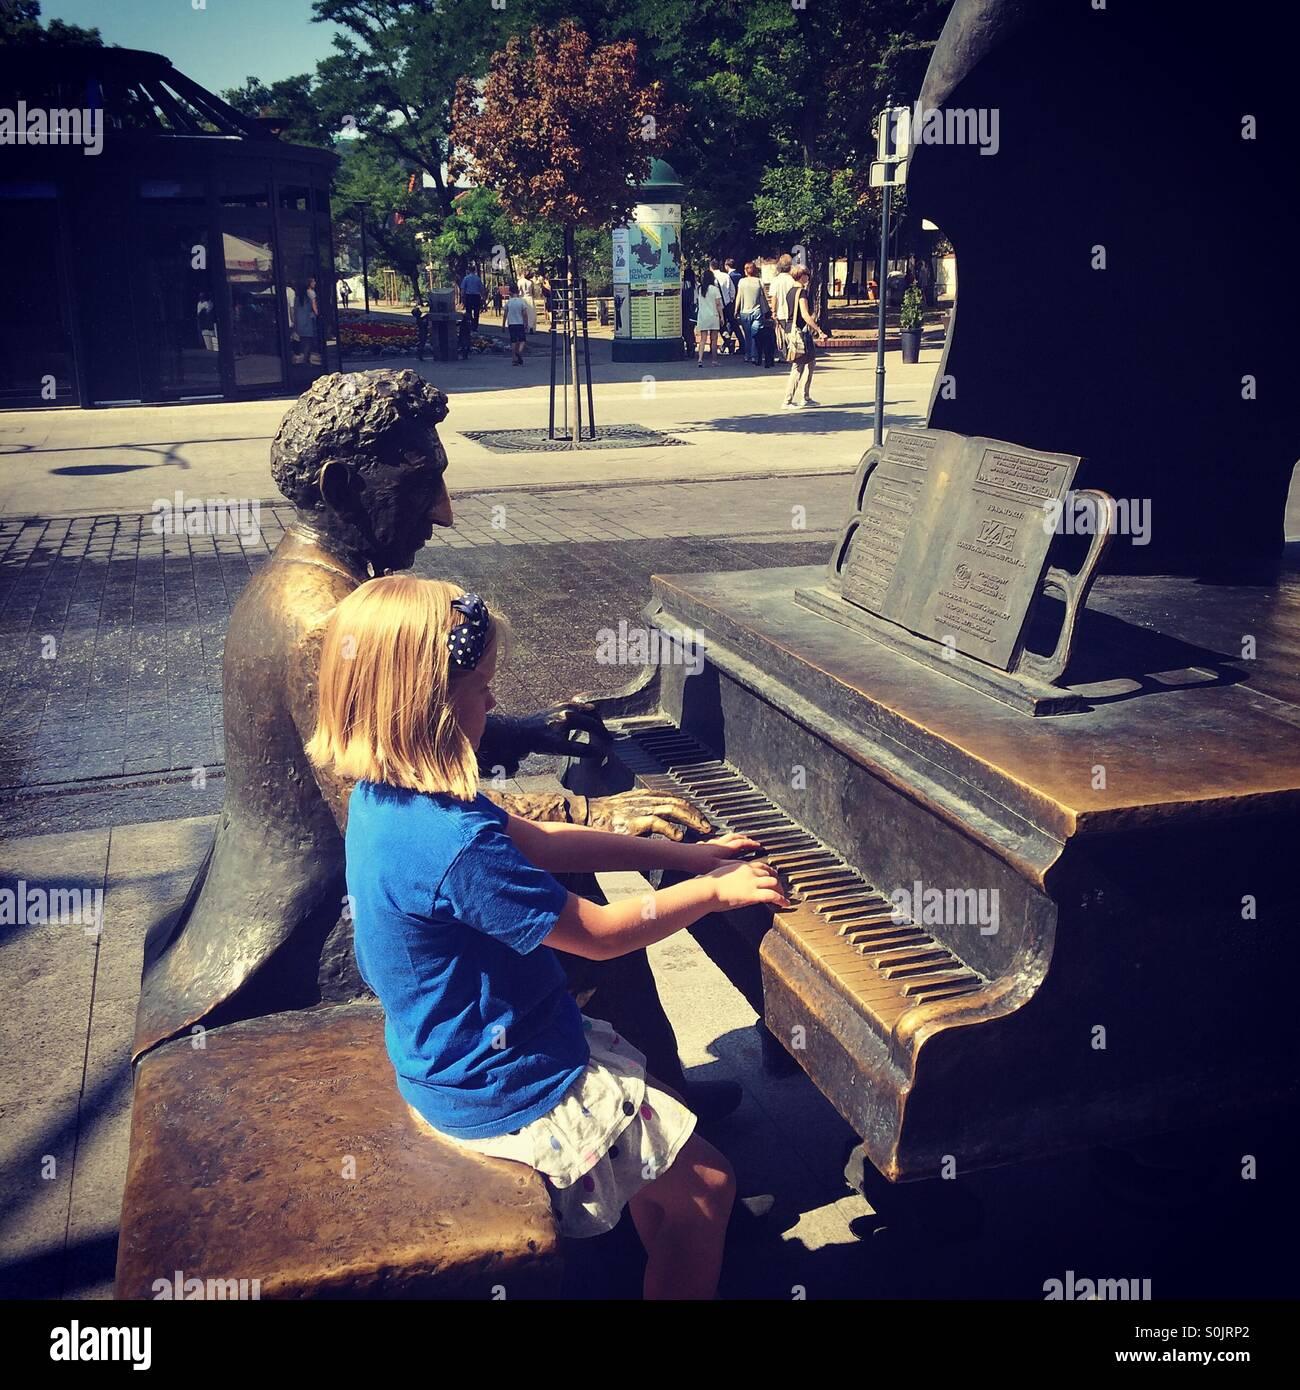 Little girl sitting next to the statue of a famous polish composer Moniuszko, on Piotrkowska street in Łódź, - Stock Image